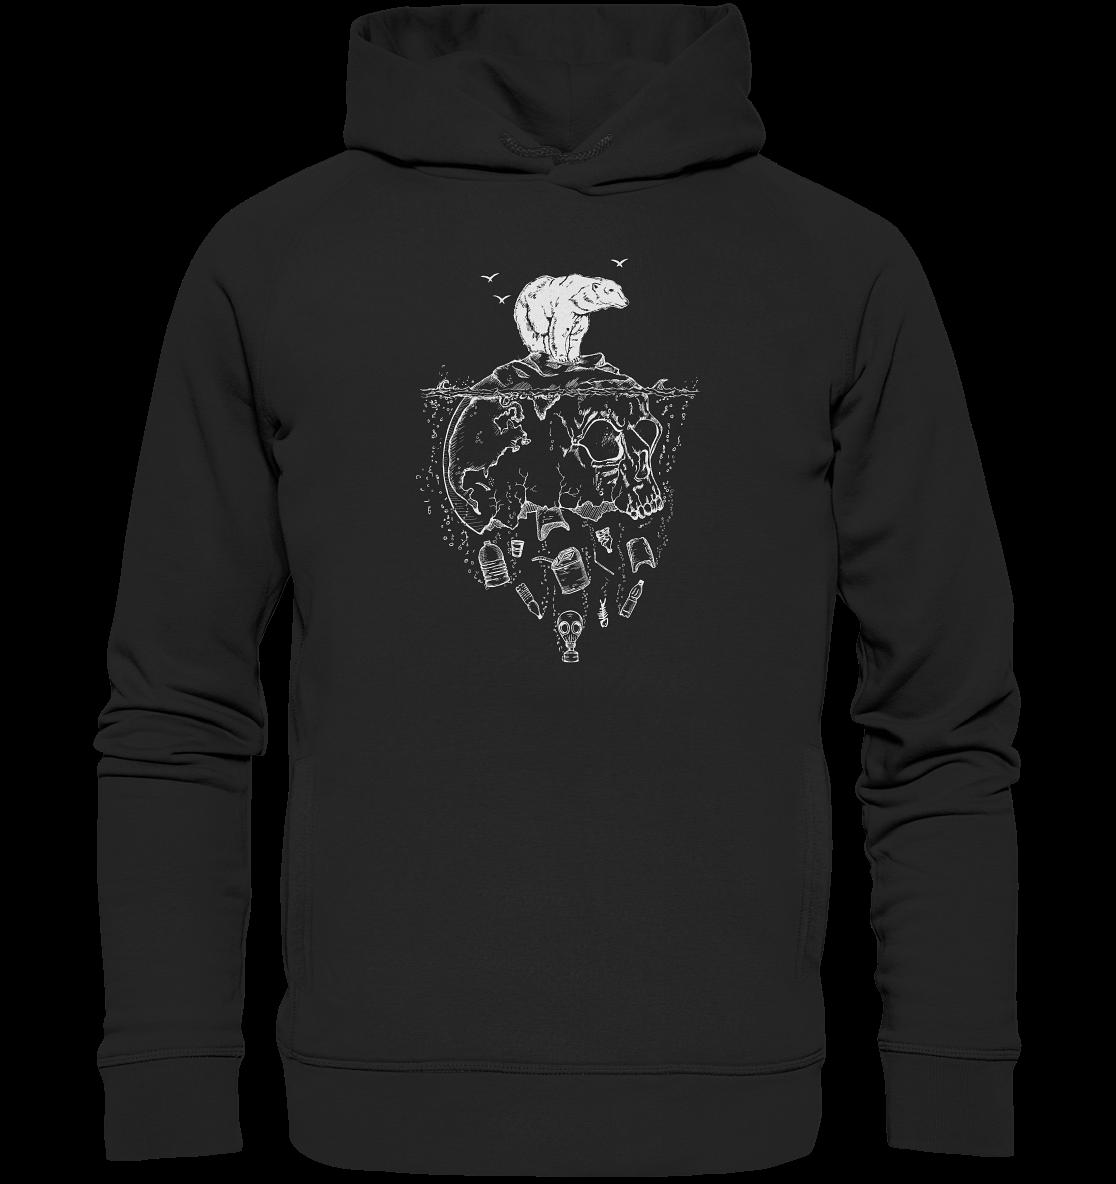 front-organic-fashion-hoodie-272727-1116x-5.png